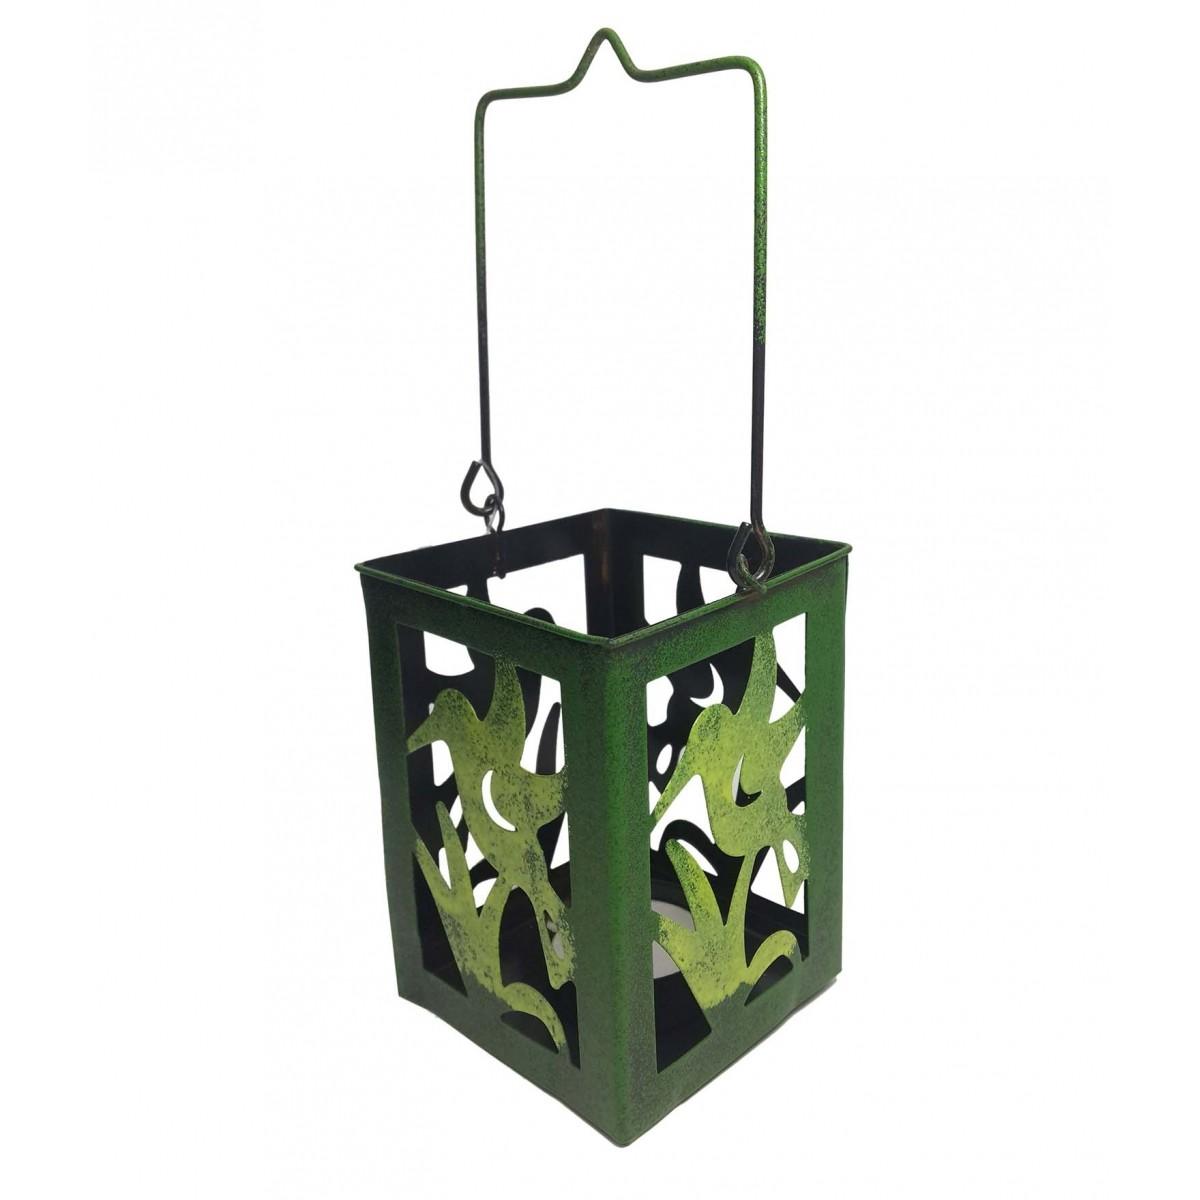 Porta Vela Decorativo Marroquina Enfeite Jardim Metal Beija Flor Verde Pequena 2 Unidades (jard-75)